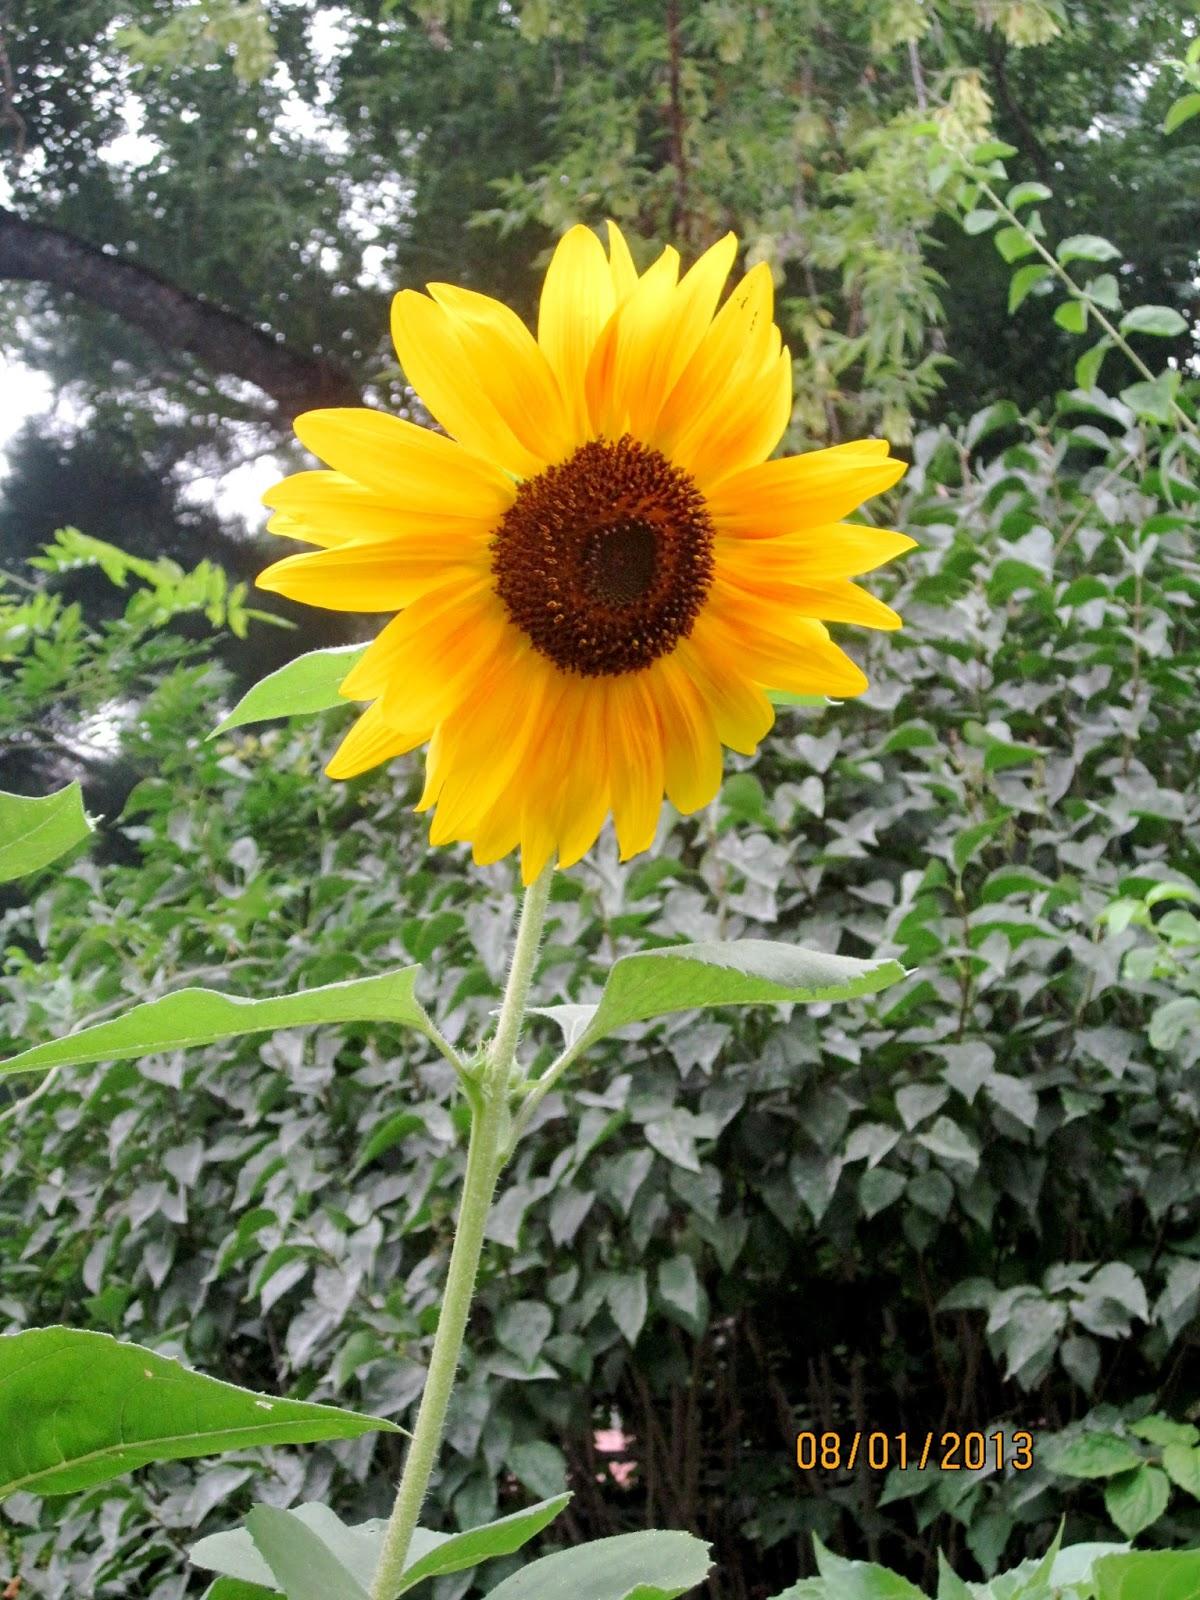 summer sunflowers andrea - photo #21